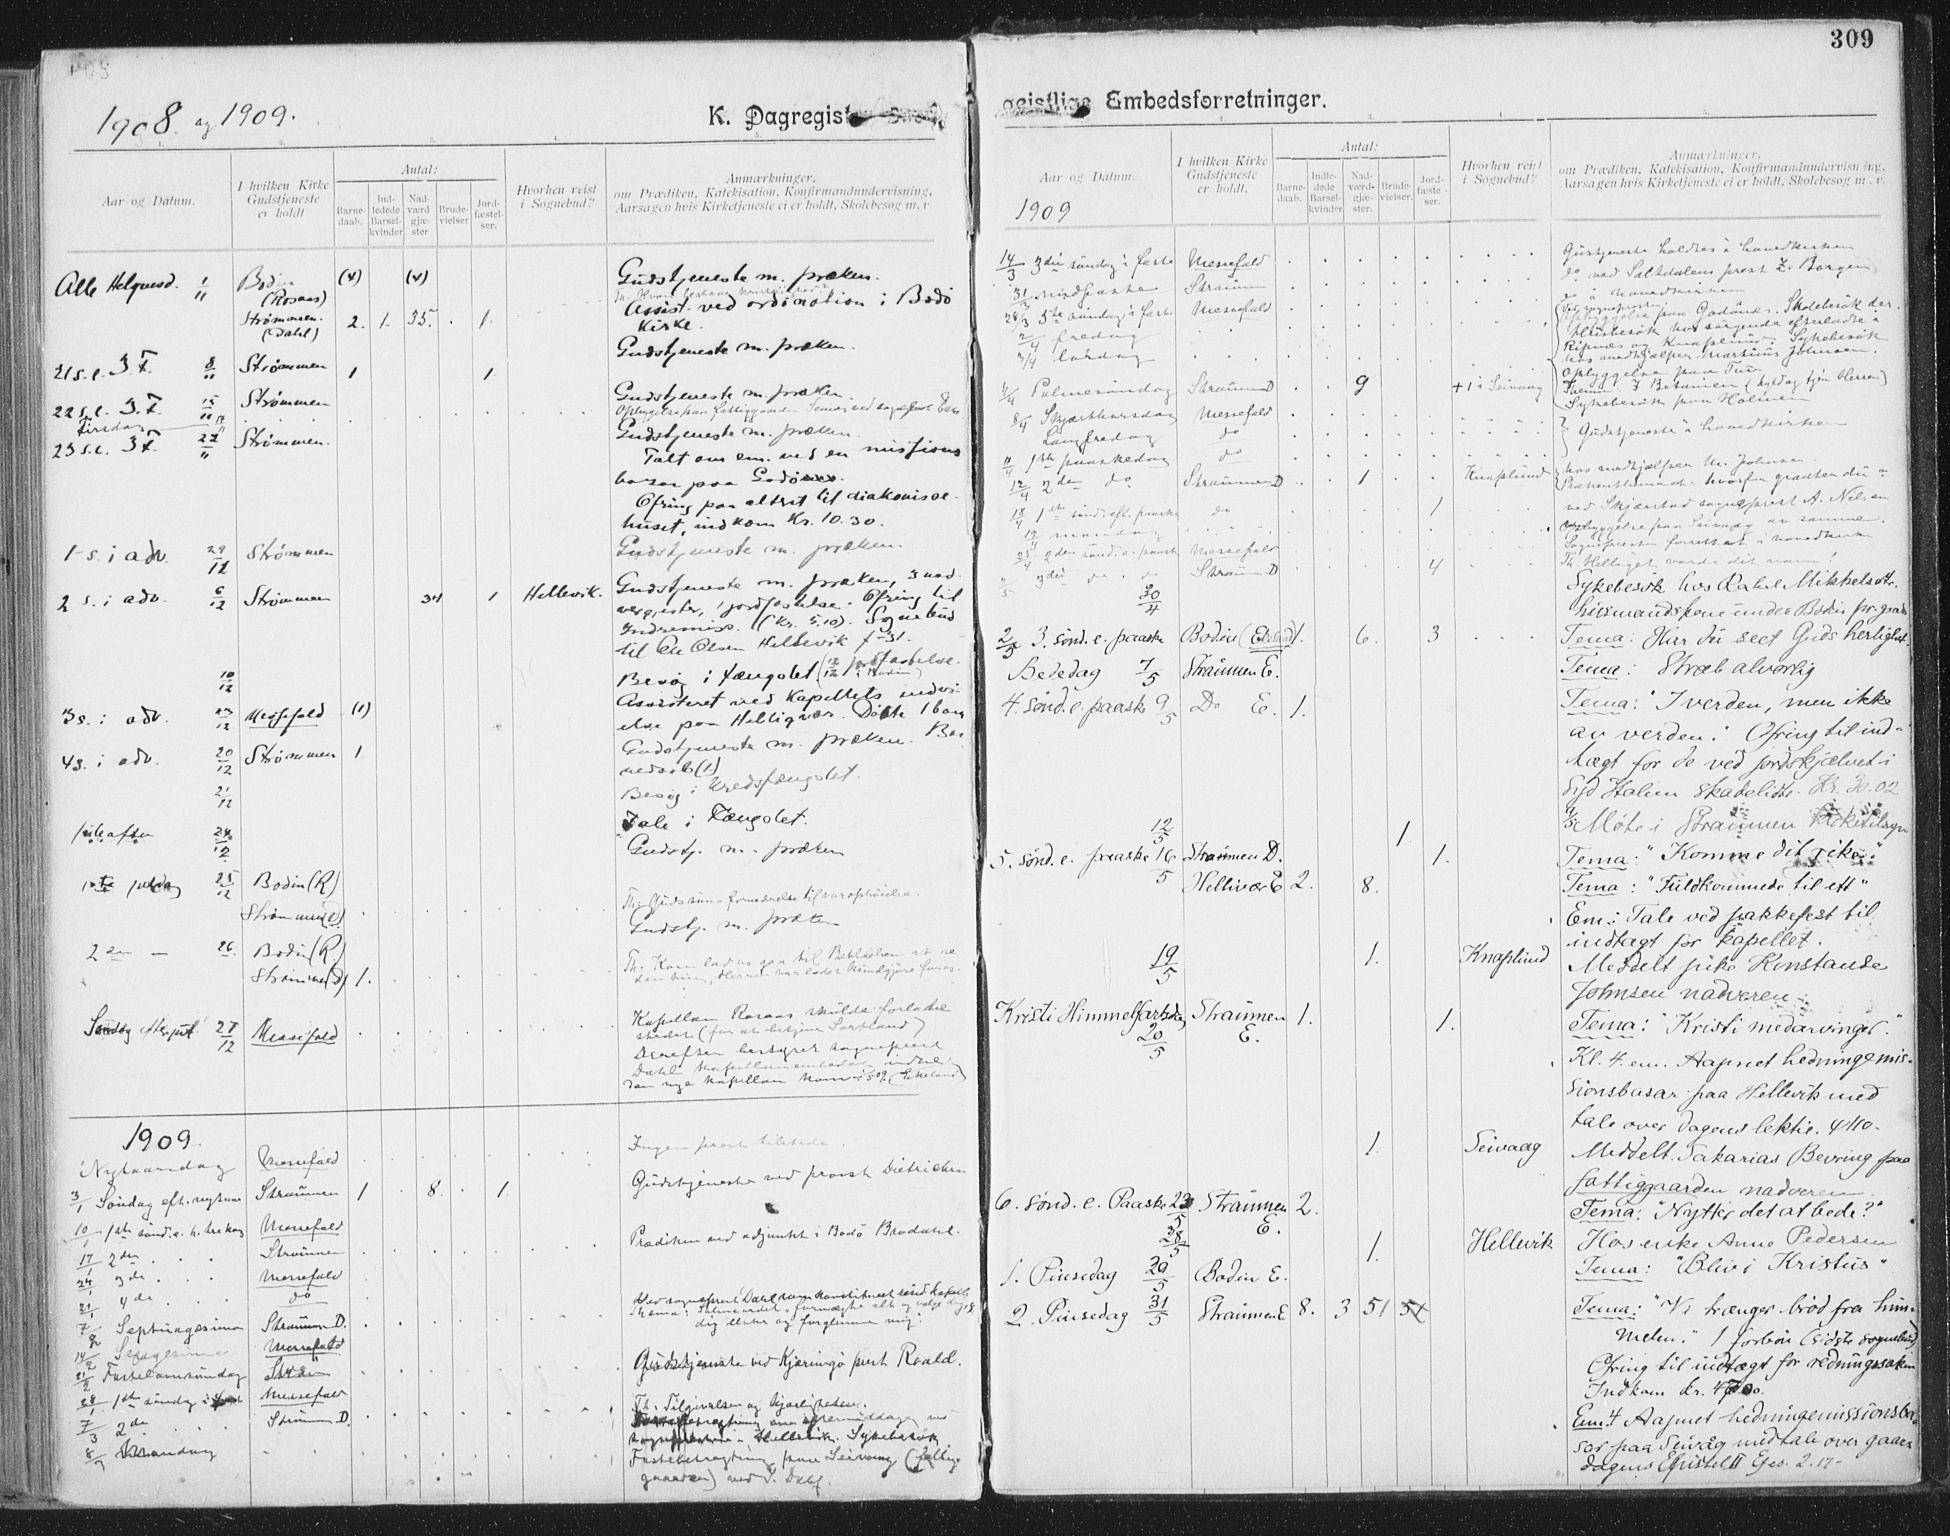 SAT, Ministerialprotokoller, klokkerbøker og fødselsregistre - Nordland, 804/L0081: Ministerialbok nr. 804A02, 1901-1915, s. 309